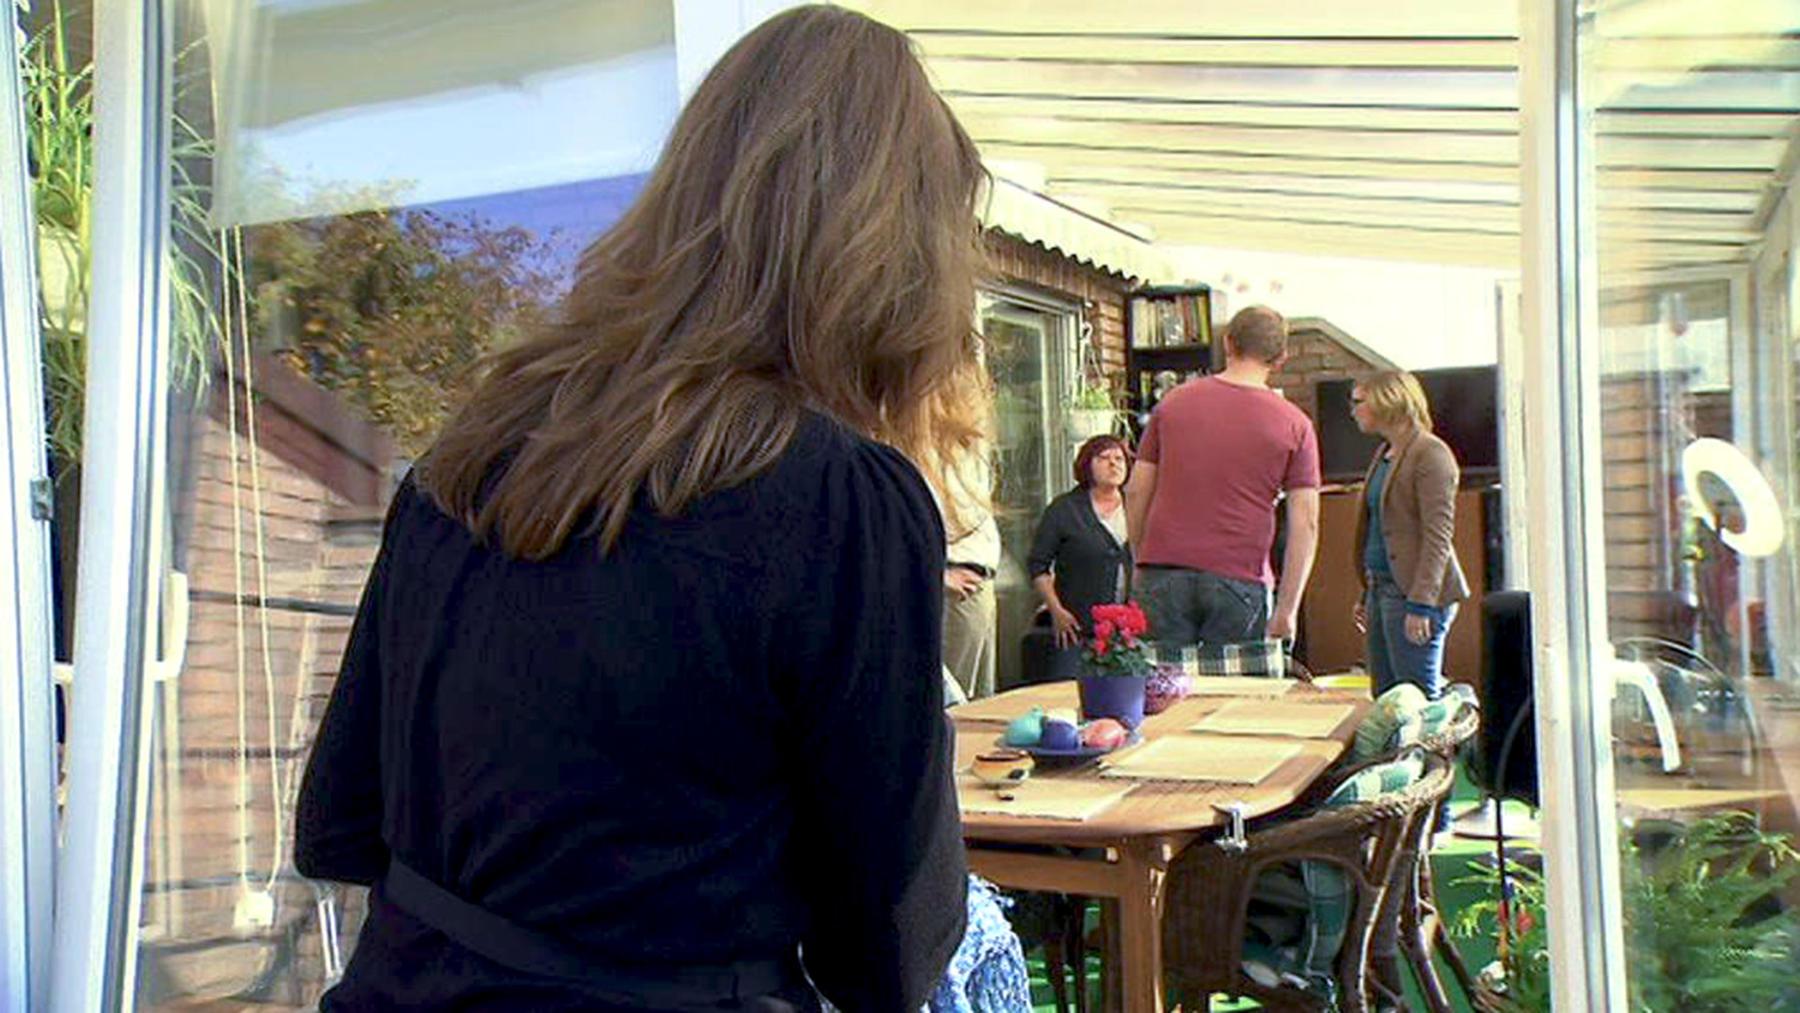 Penetrante Nachbarin macht Hausfrau das Leben schwer   Folge 110